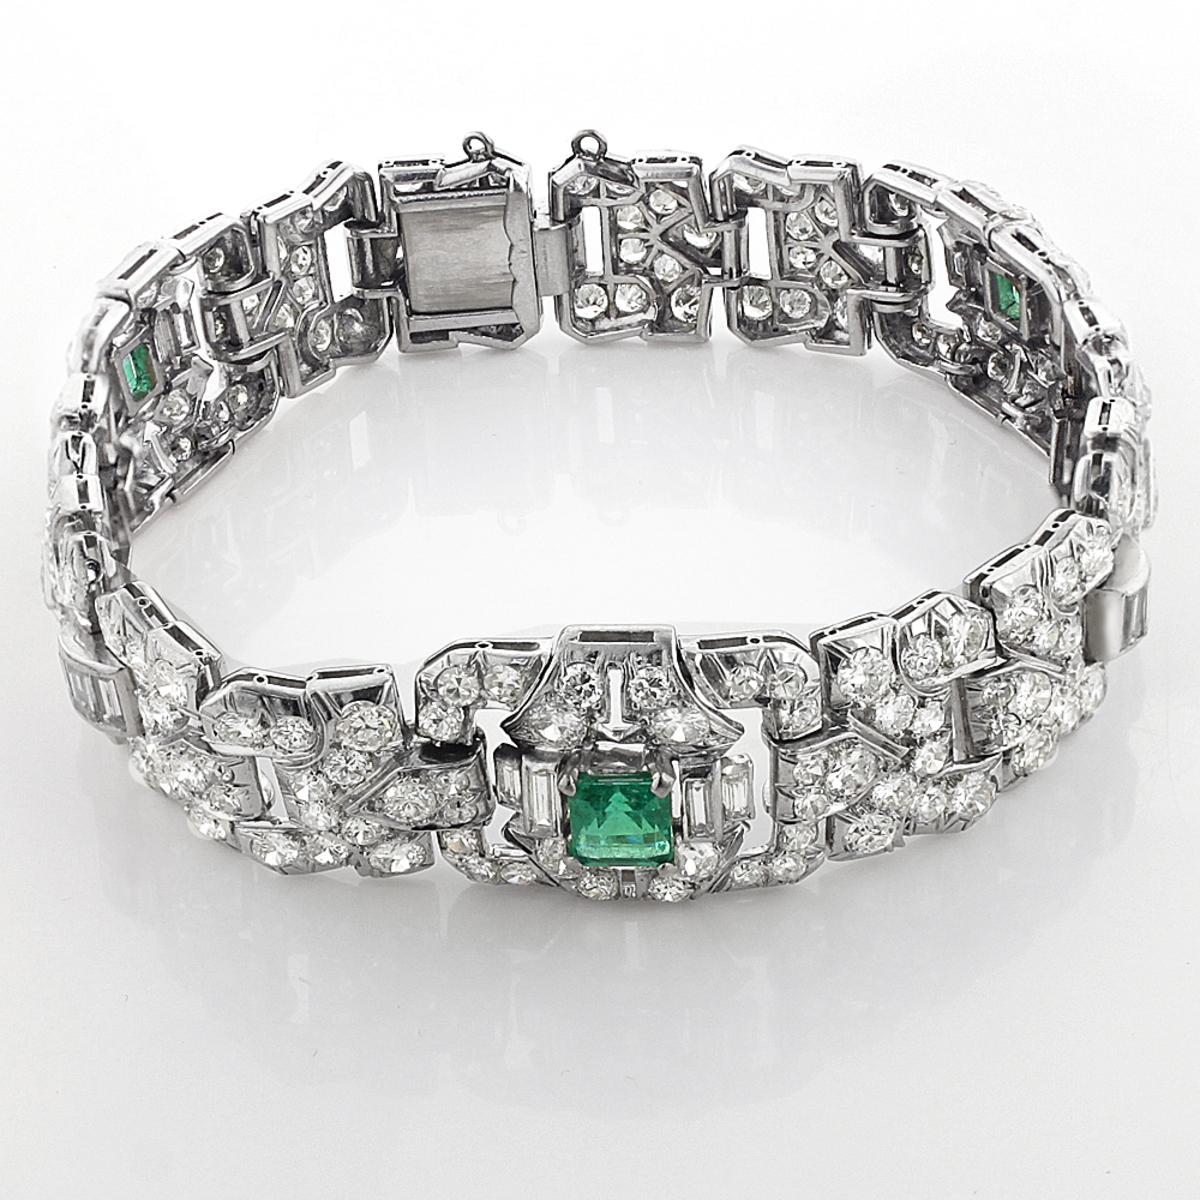 Vintage Fine Estate Jewelry: Platinum Diamond Bracelet for Women w Emeralds